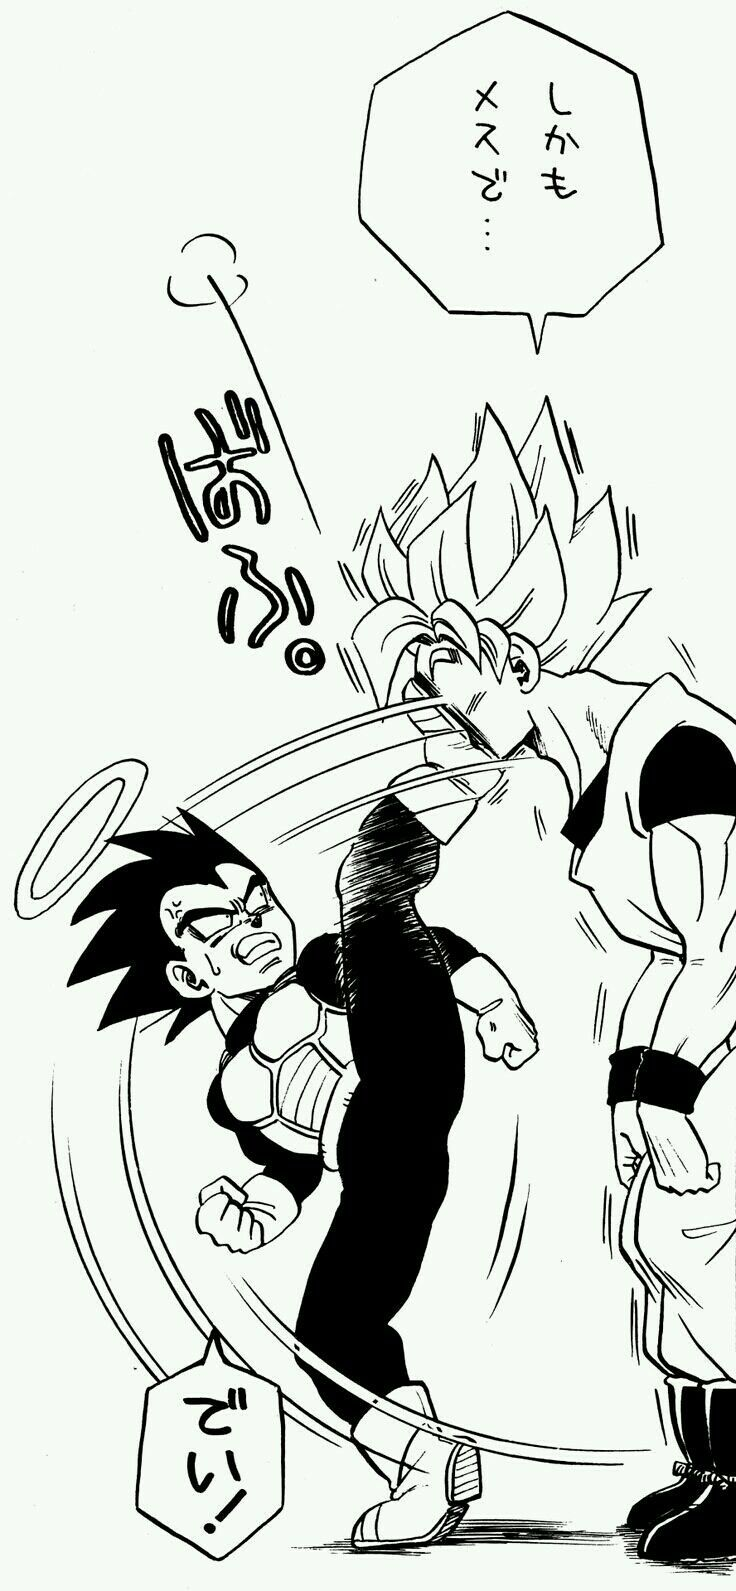 Pics Of Goku And Vegeta Fanfiction Fanfiction Amreading Books Wattpad Dragon Ball Super Art Dragon Ball Z Dragon Ball Image